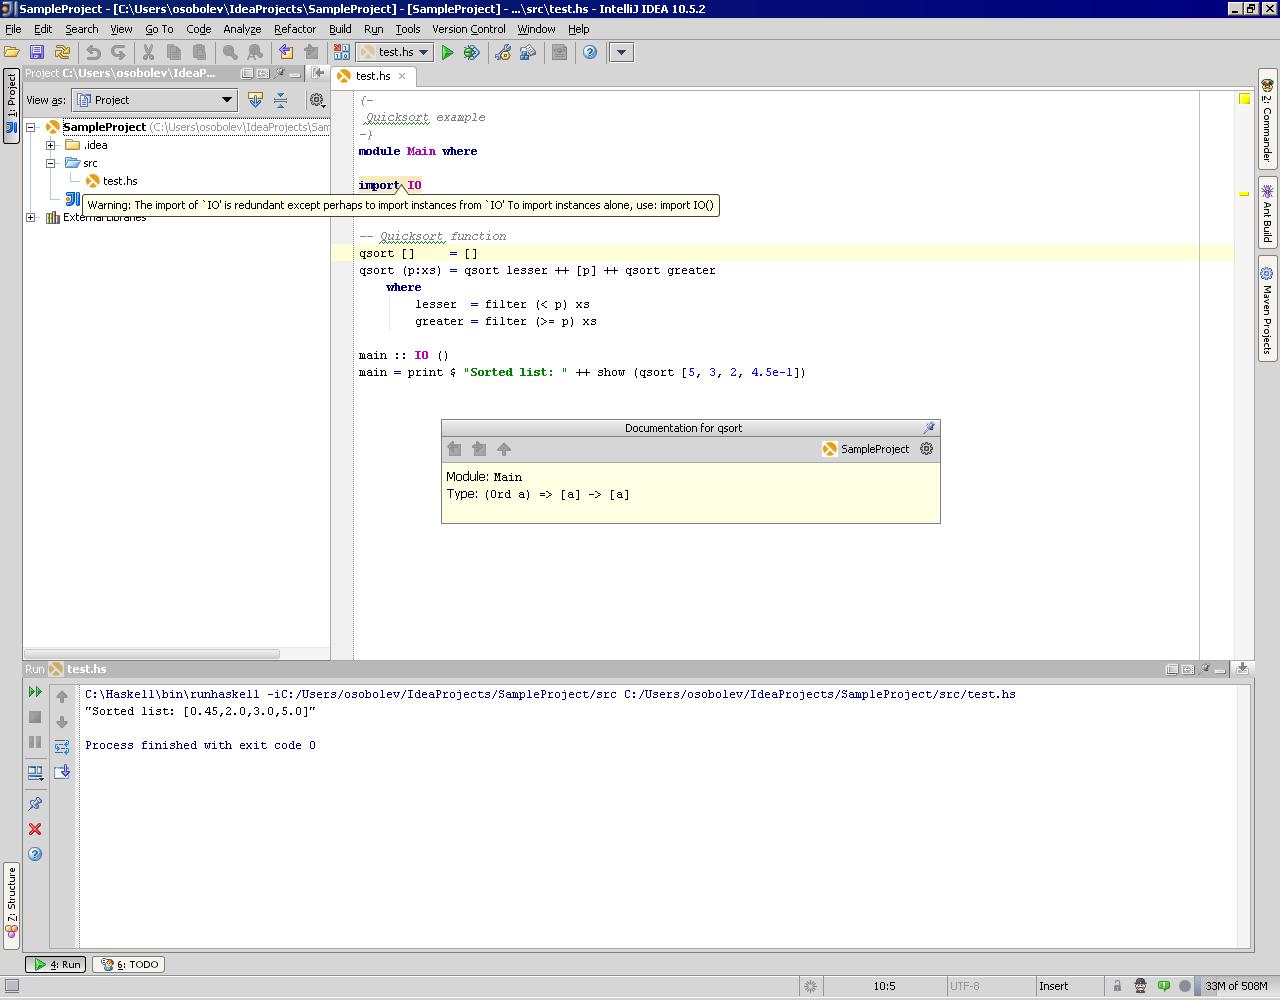 Screenshot #10782